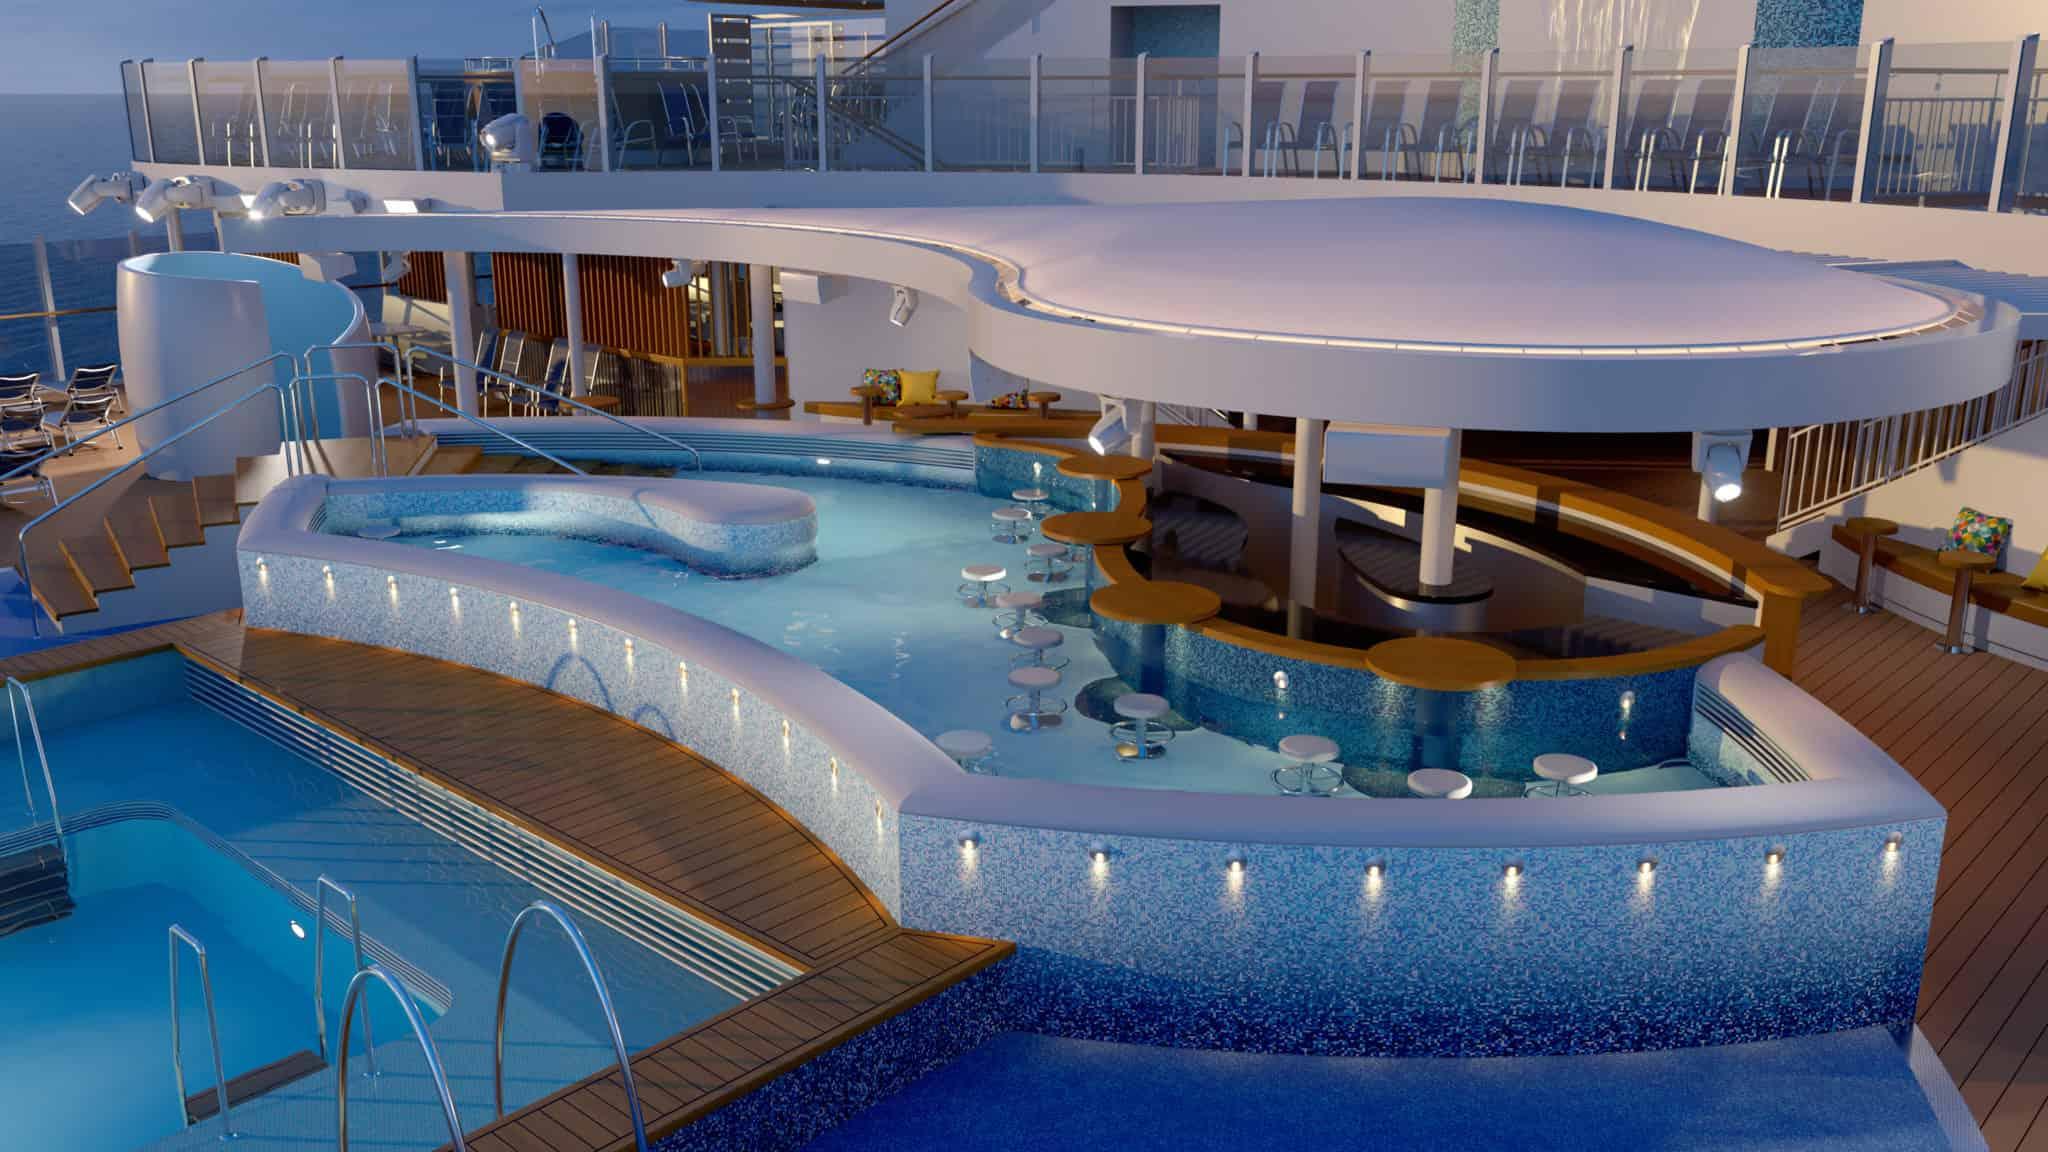 P&O cruises arvia rendering